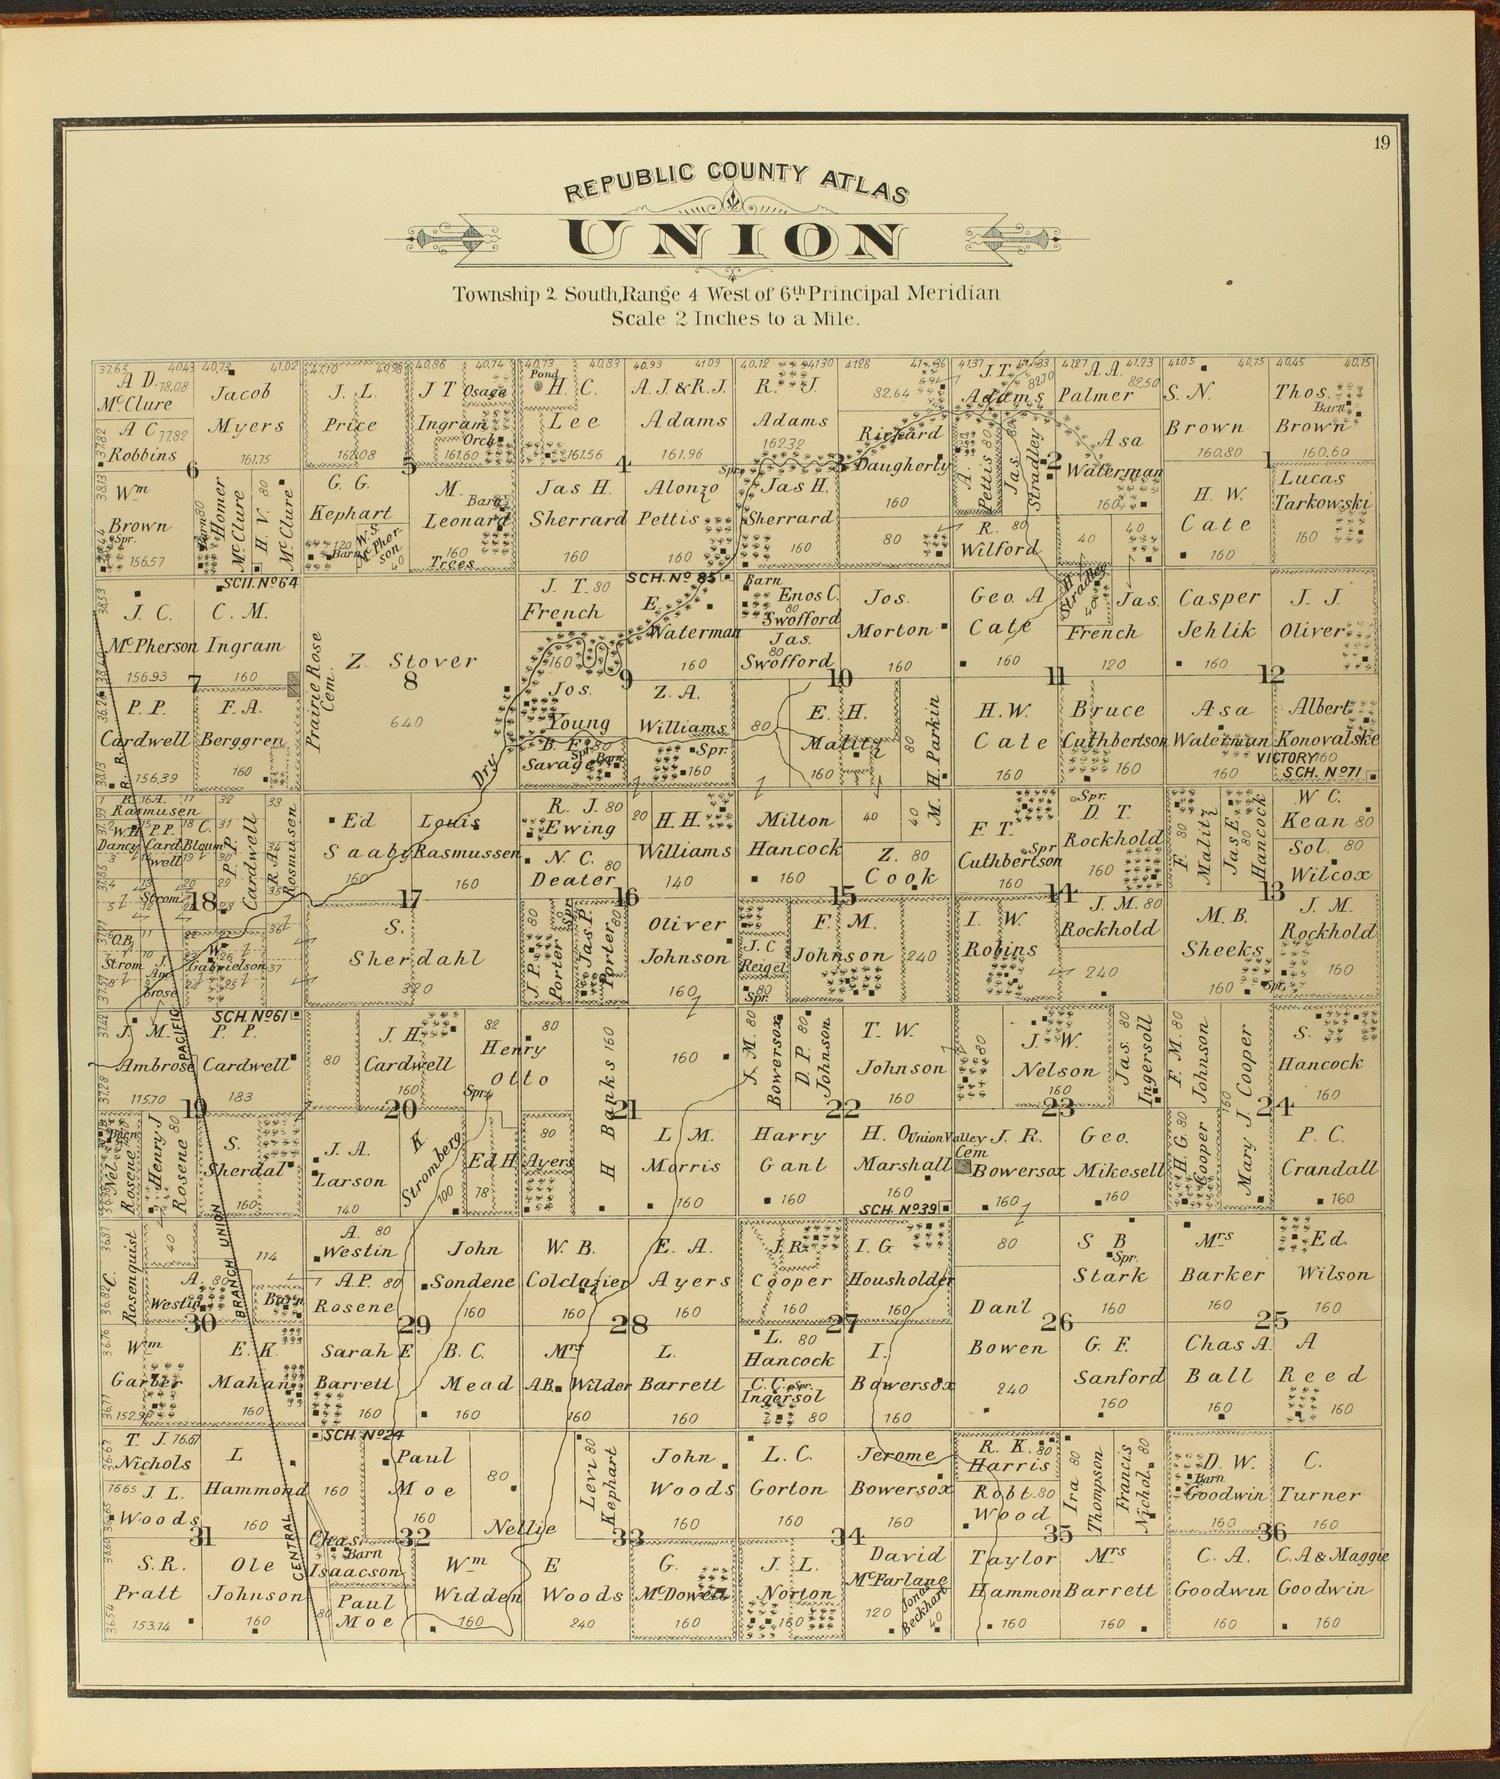 Atlas of Republic County, Kansas - 19